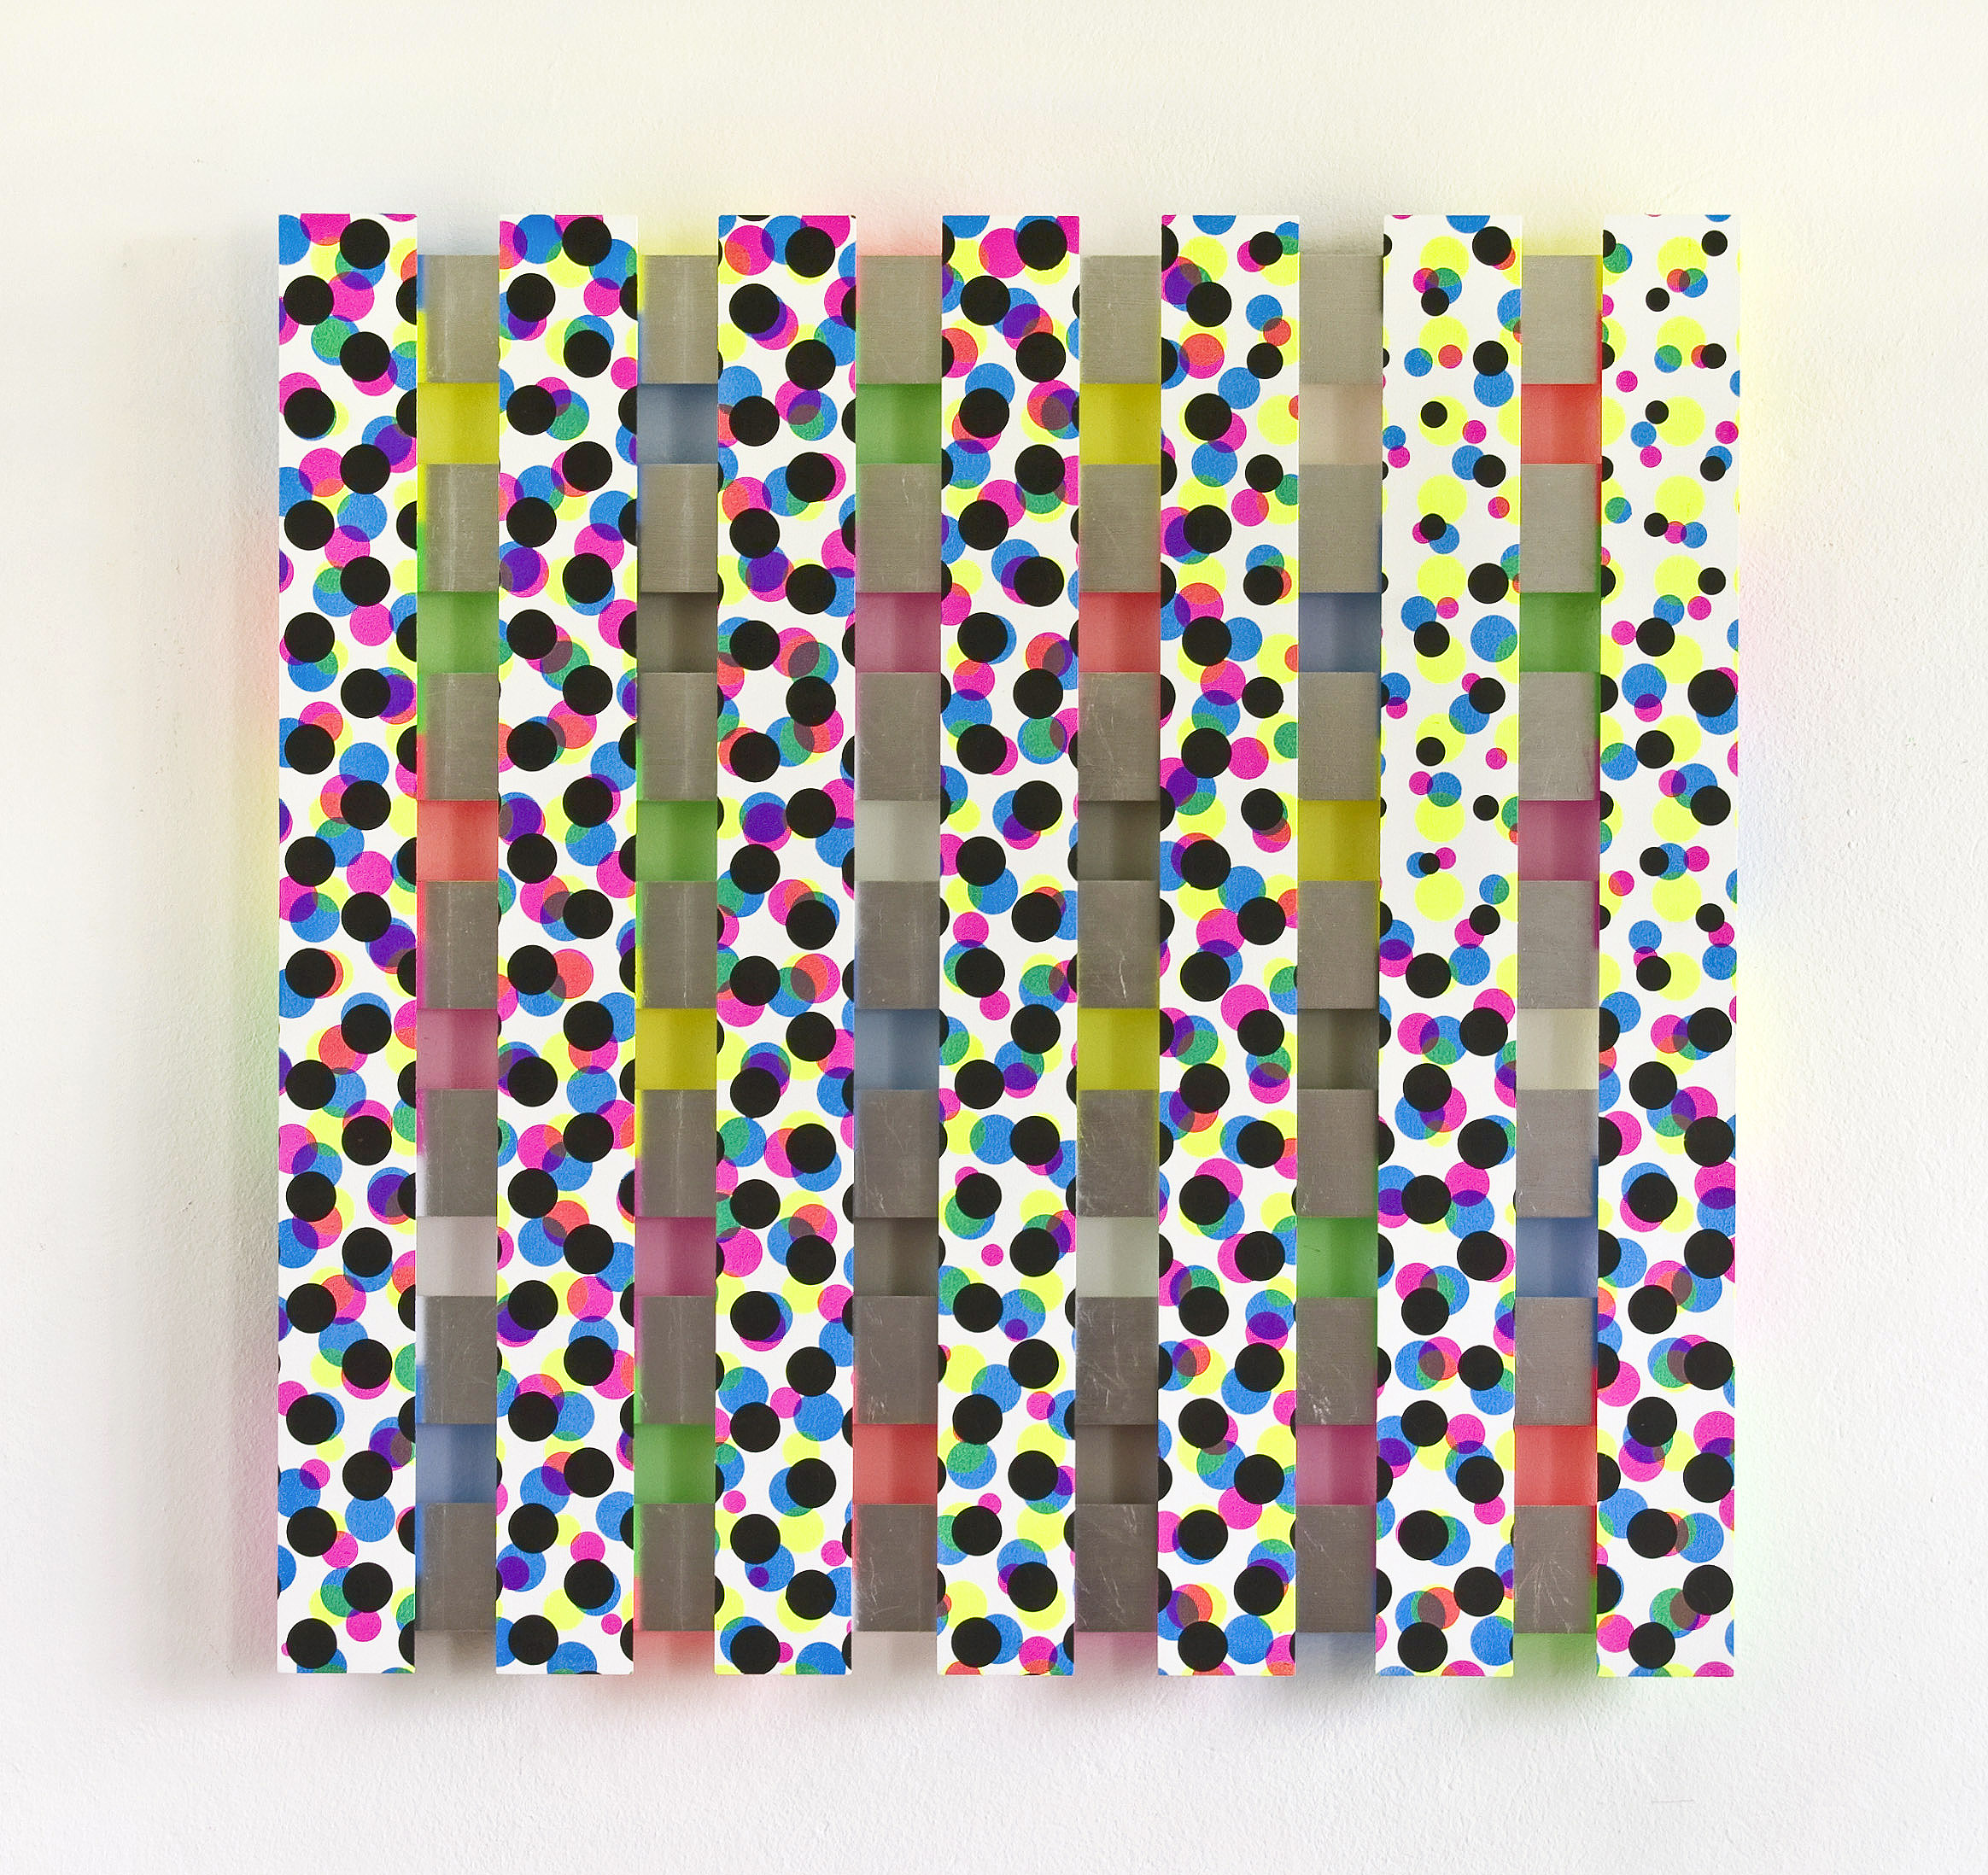 4e akril, les, 79 x 79 cm, 2011.jpg